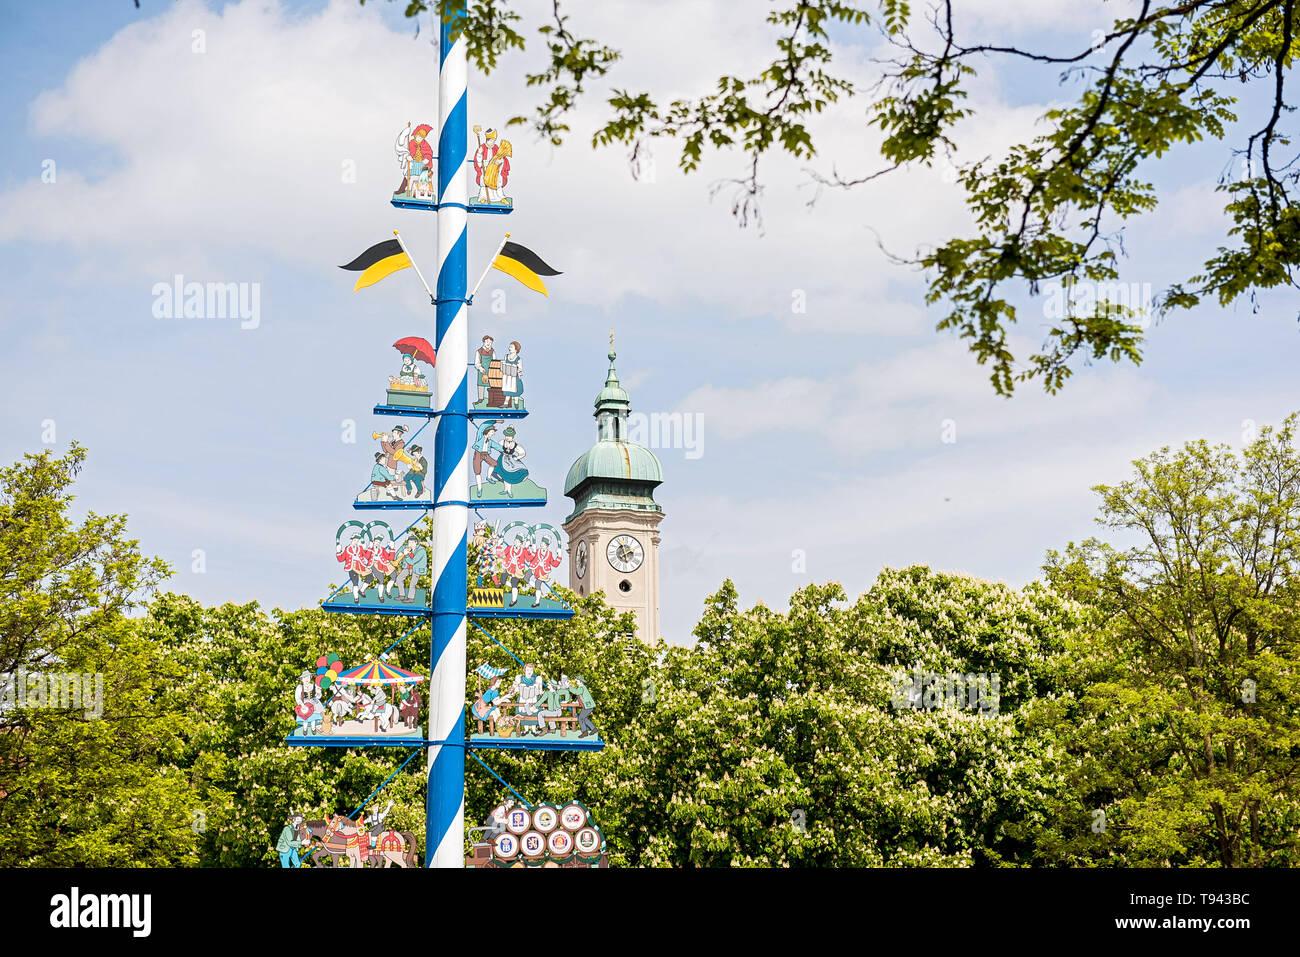 Maibaum on Viktualienmarkt, München, Germany - Stock Image